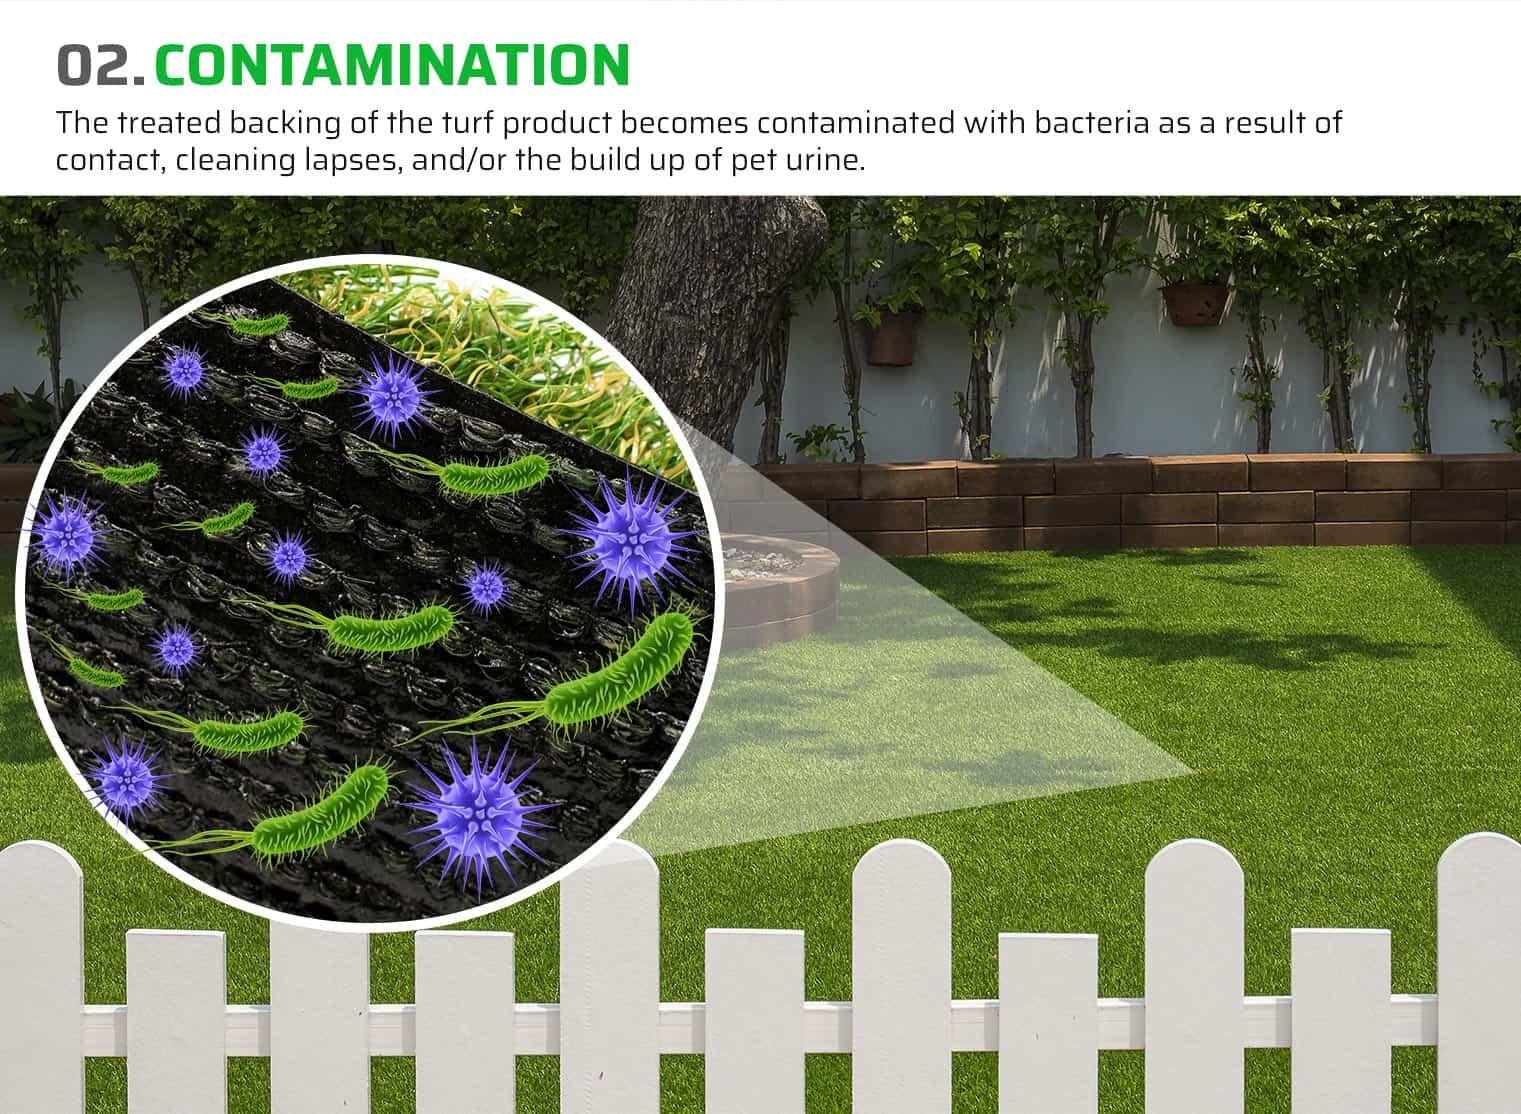 02. Contamination